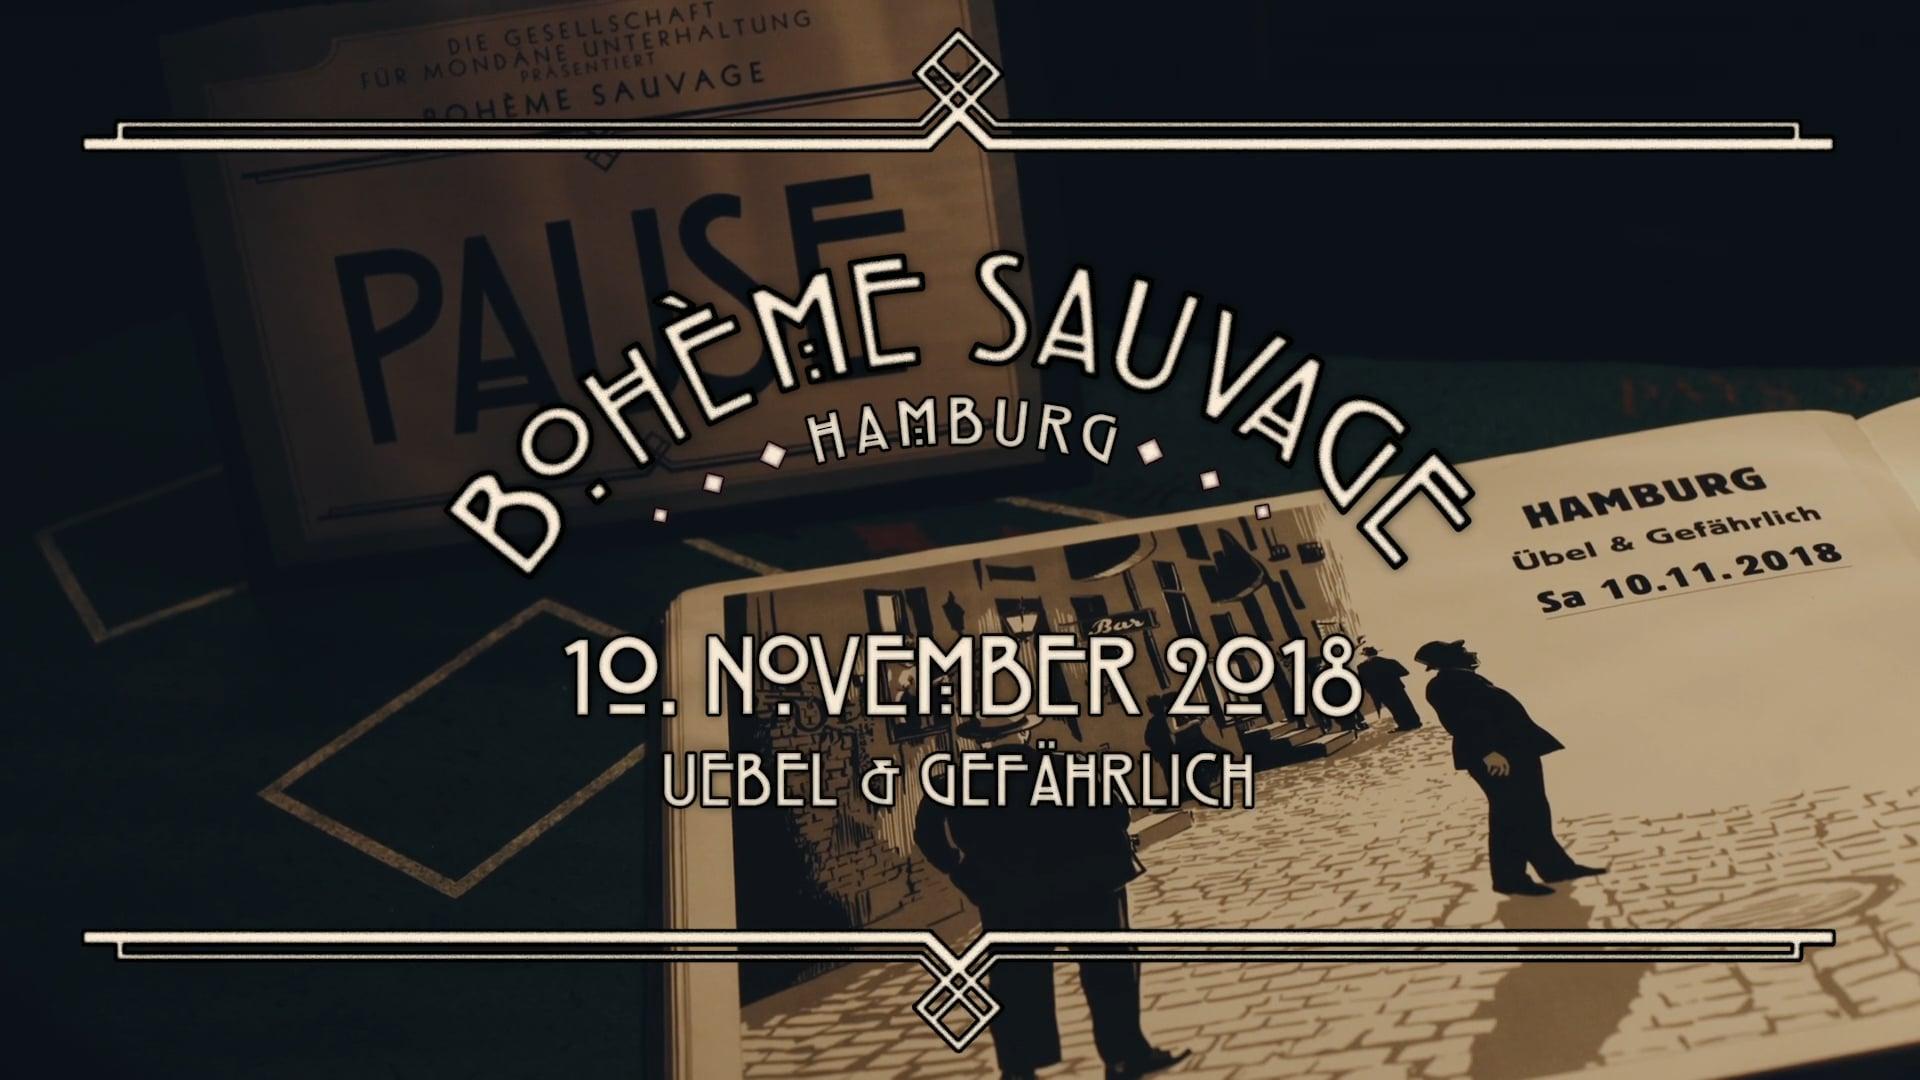 Bohème Sauvage Hamburg Nº25 - 10. November 2018 - Uebel & Gefährlich